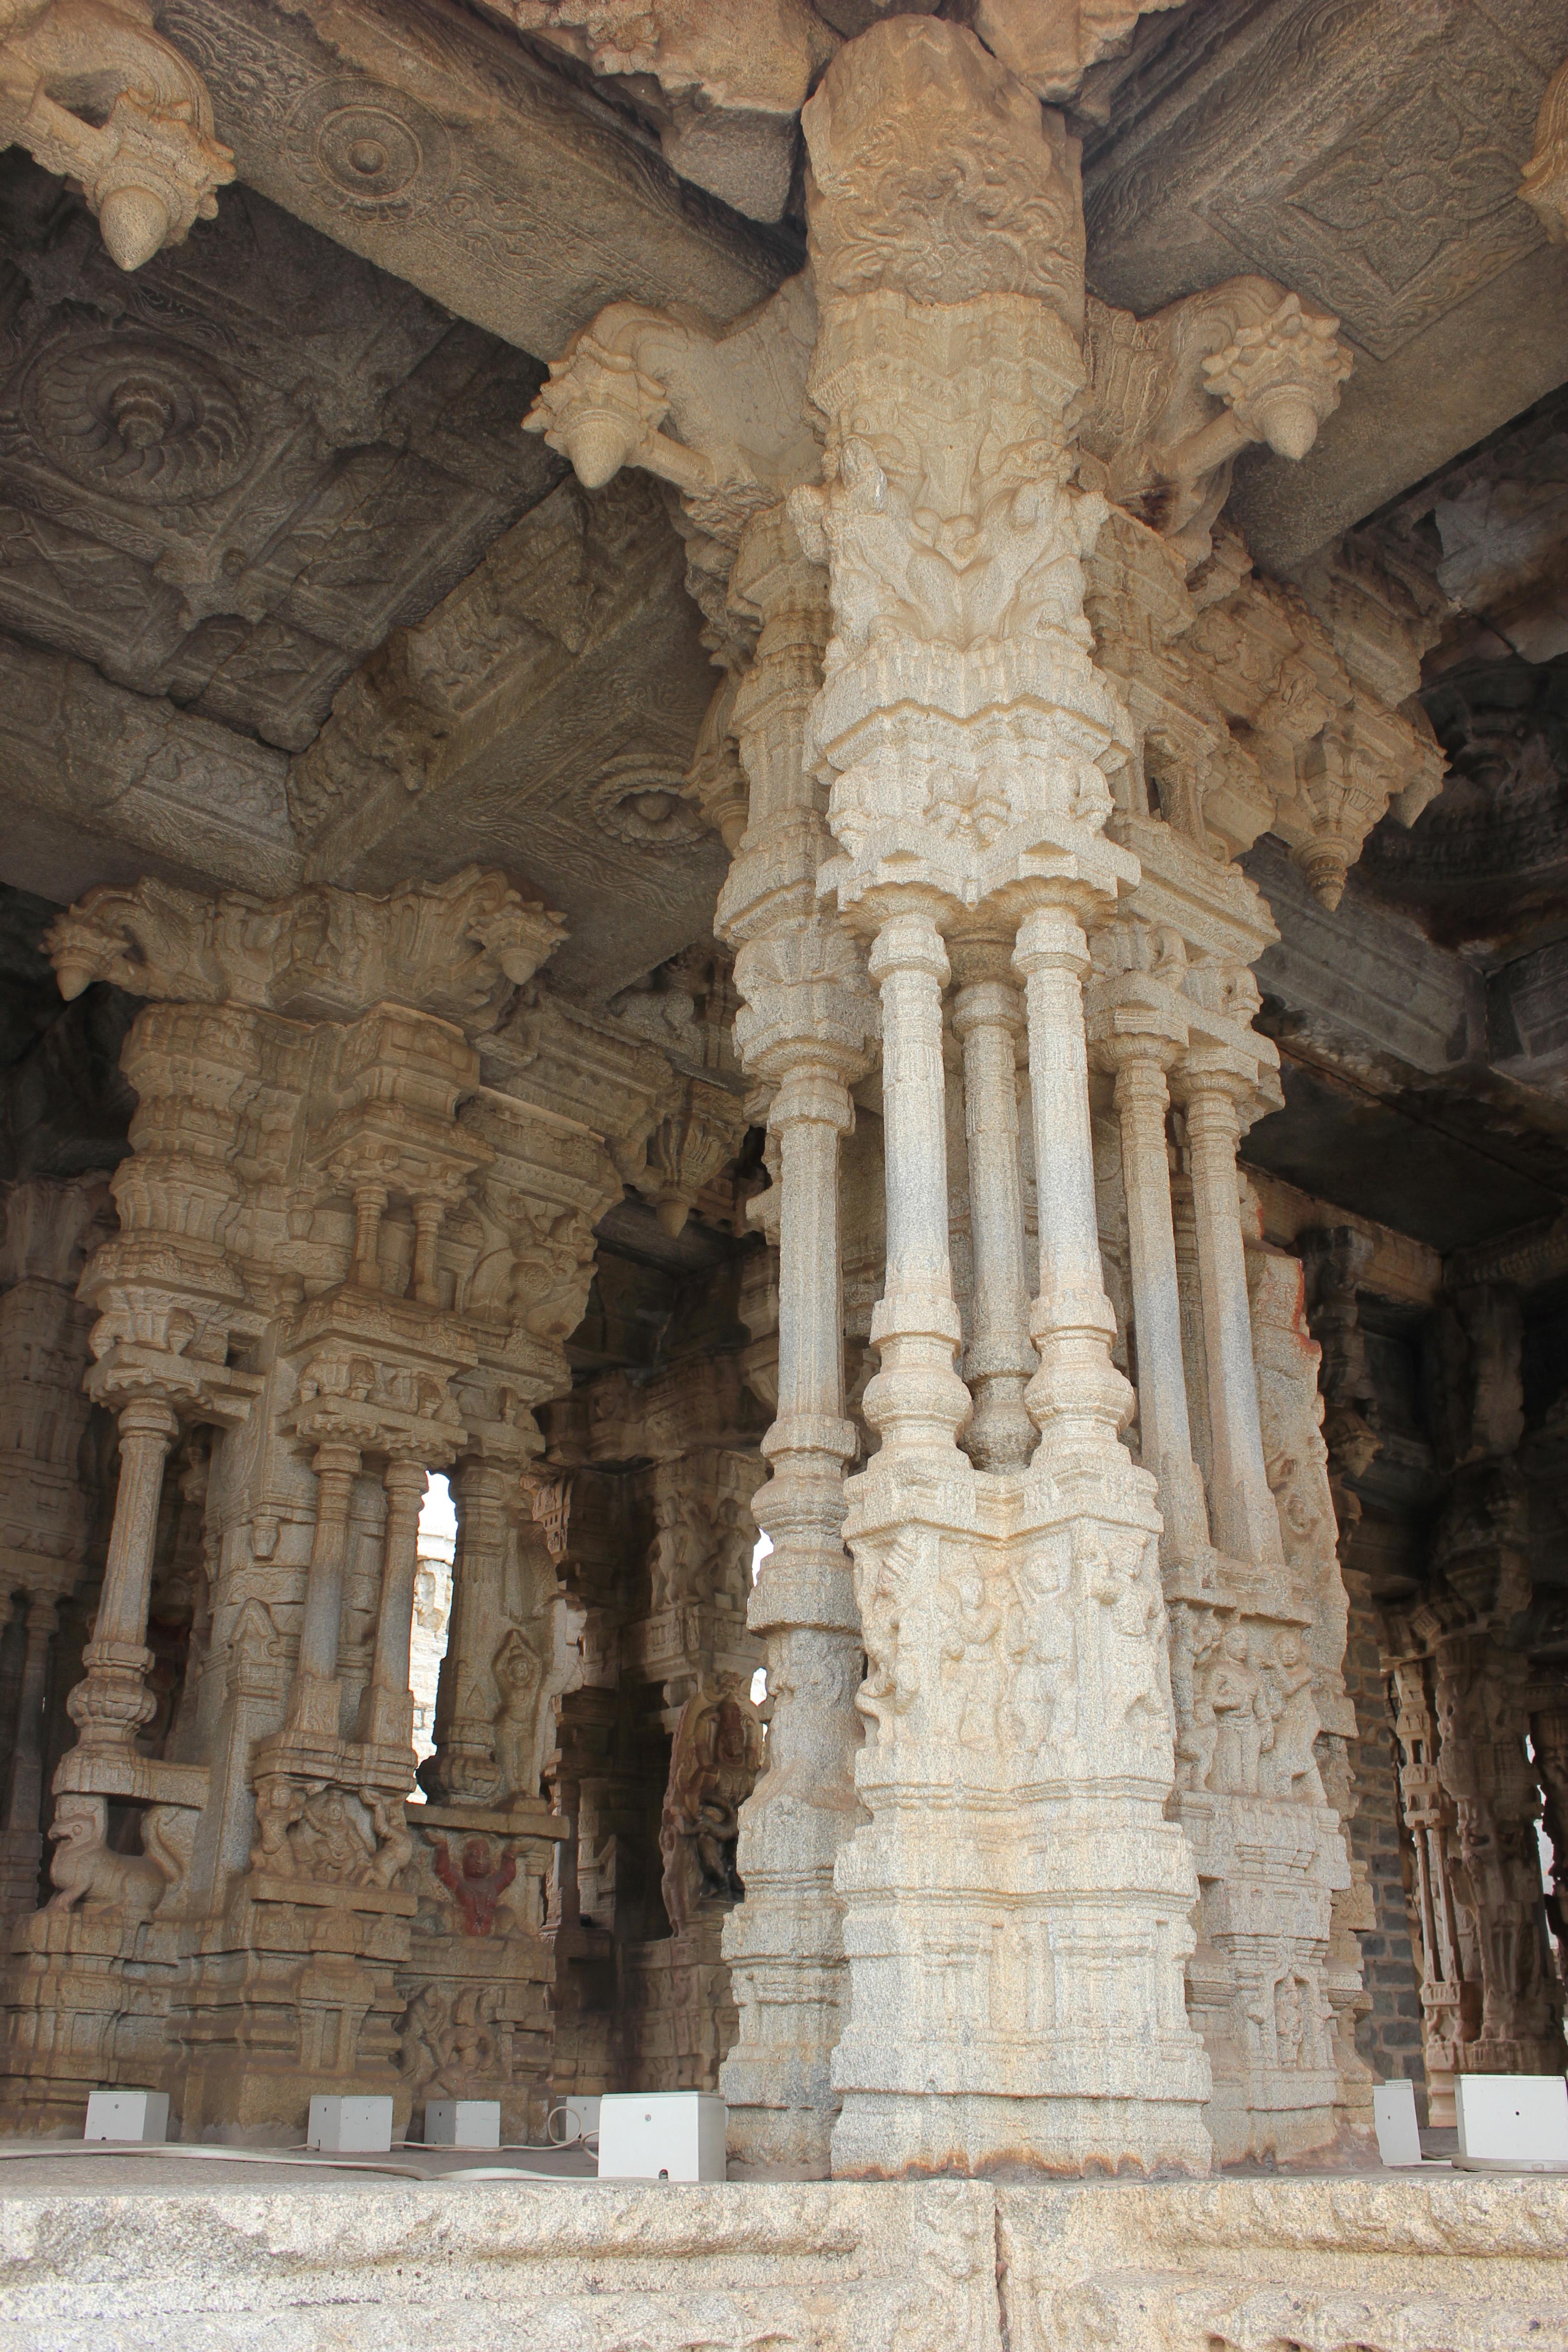 File:Decorative pillars in the main mantapa in the Vitthala temple complex  in Hampi 2